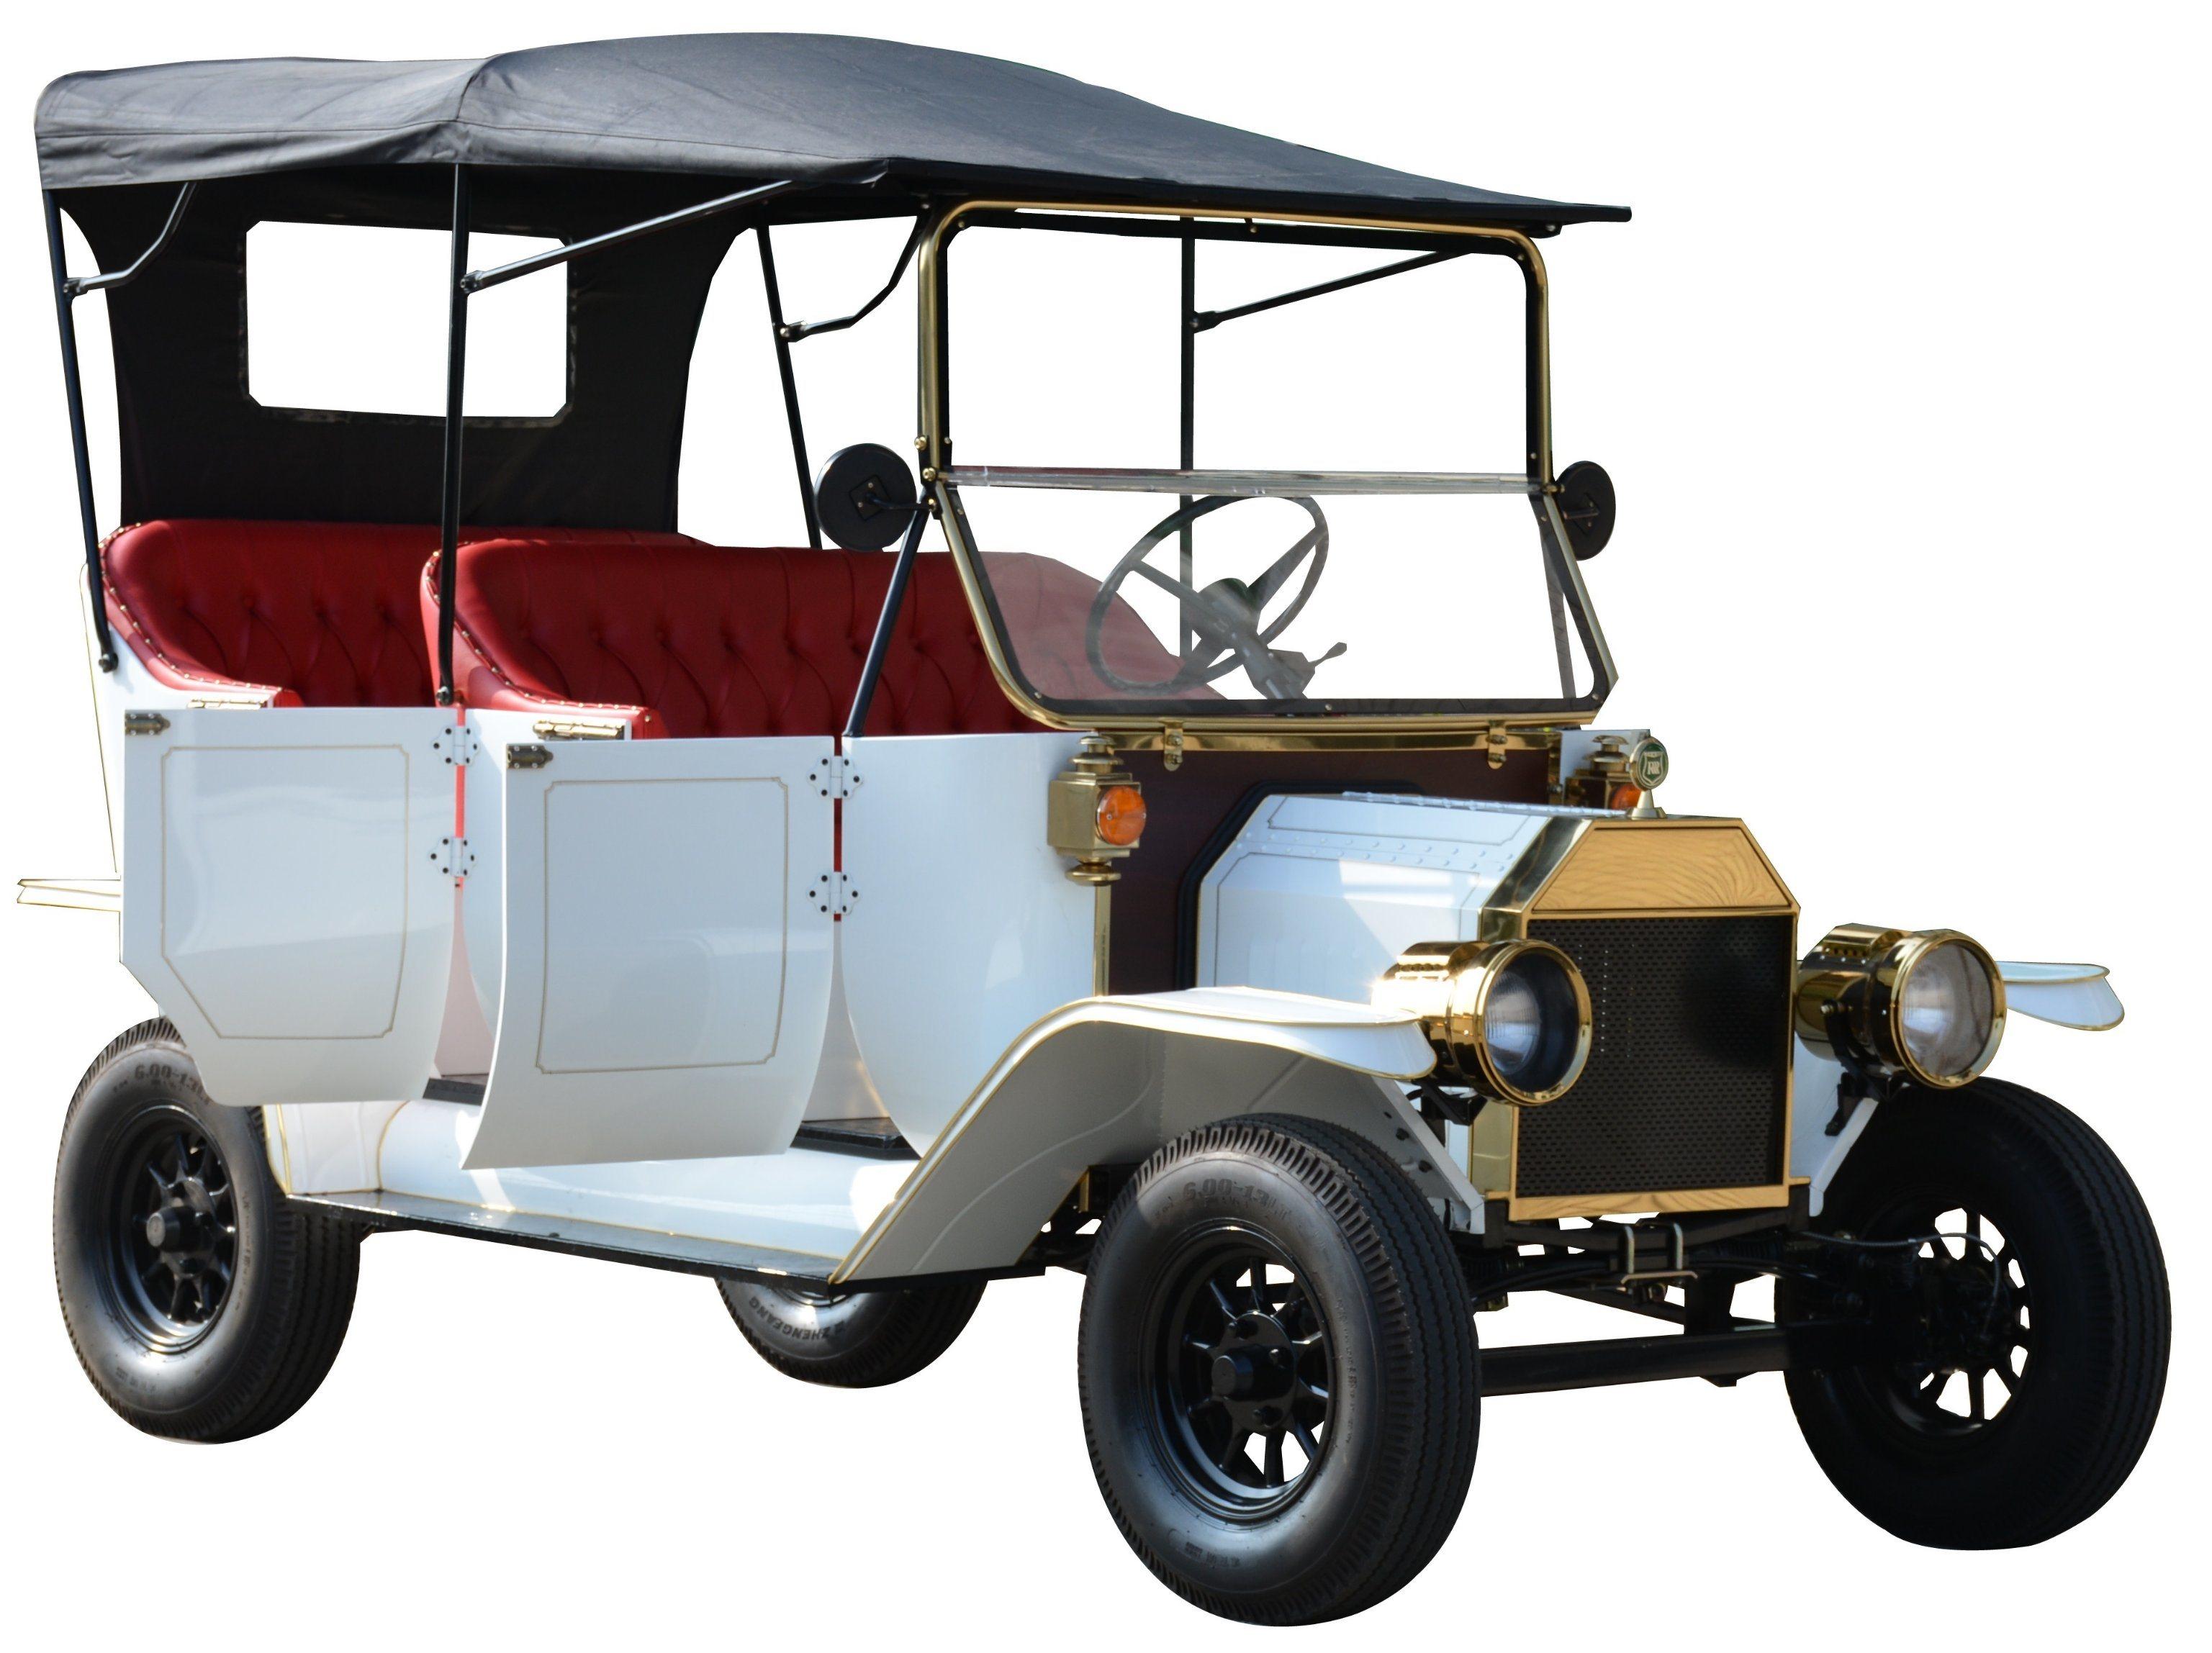 Origianl Manufacturer 4 Passenger Electric Vintage Buggy Car